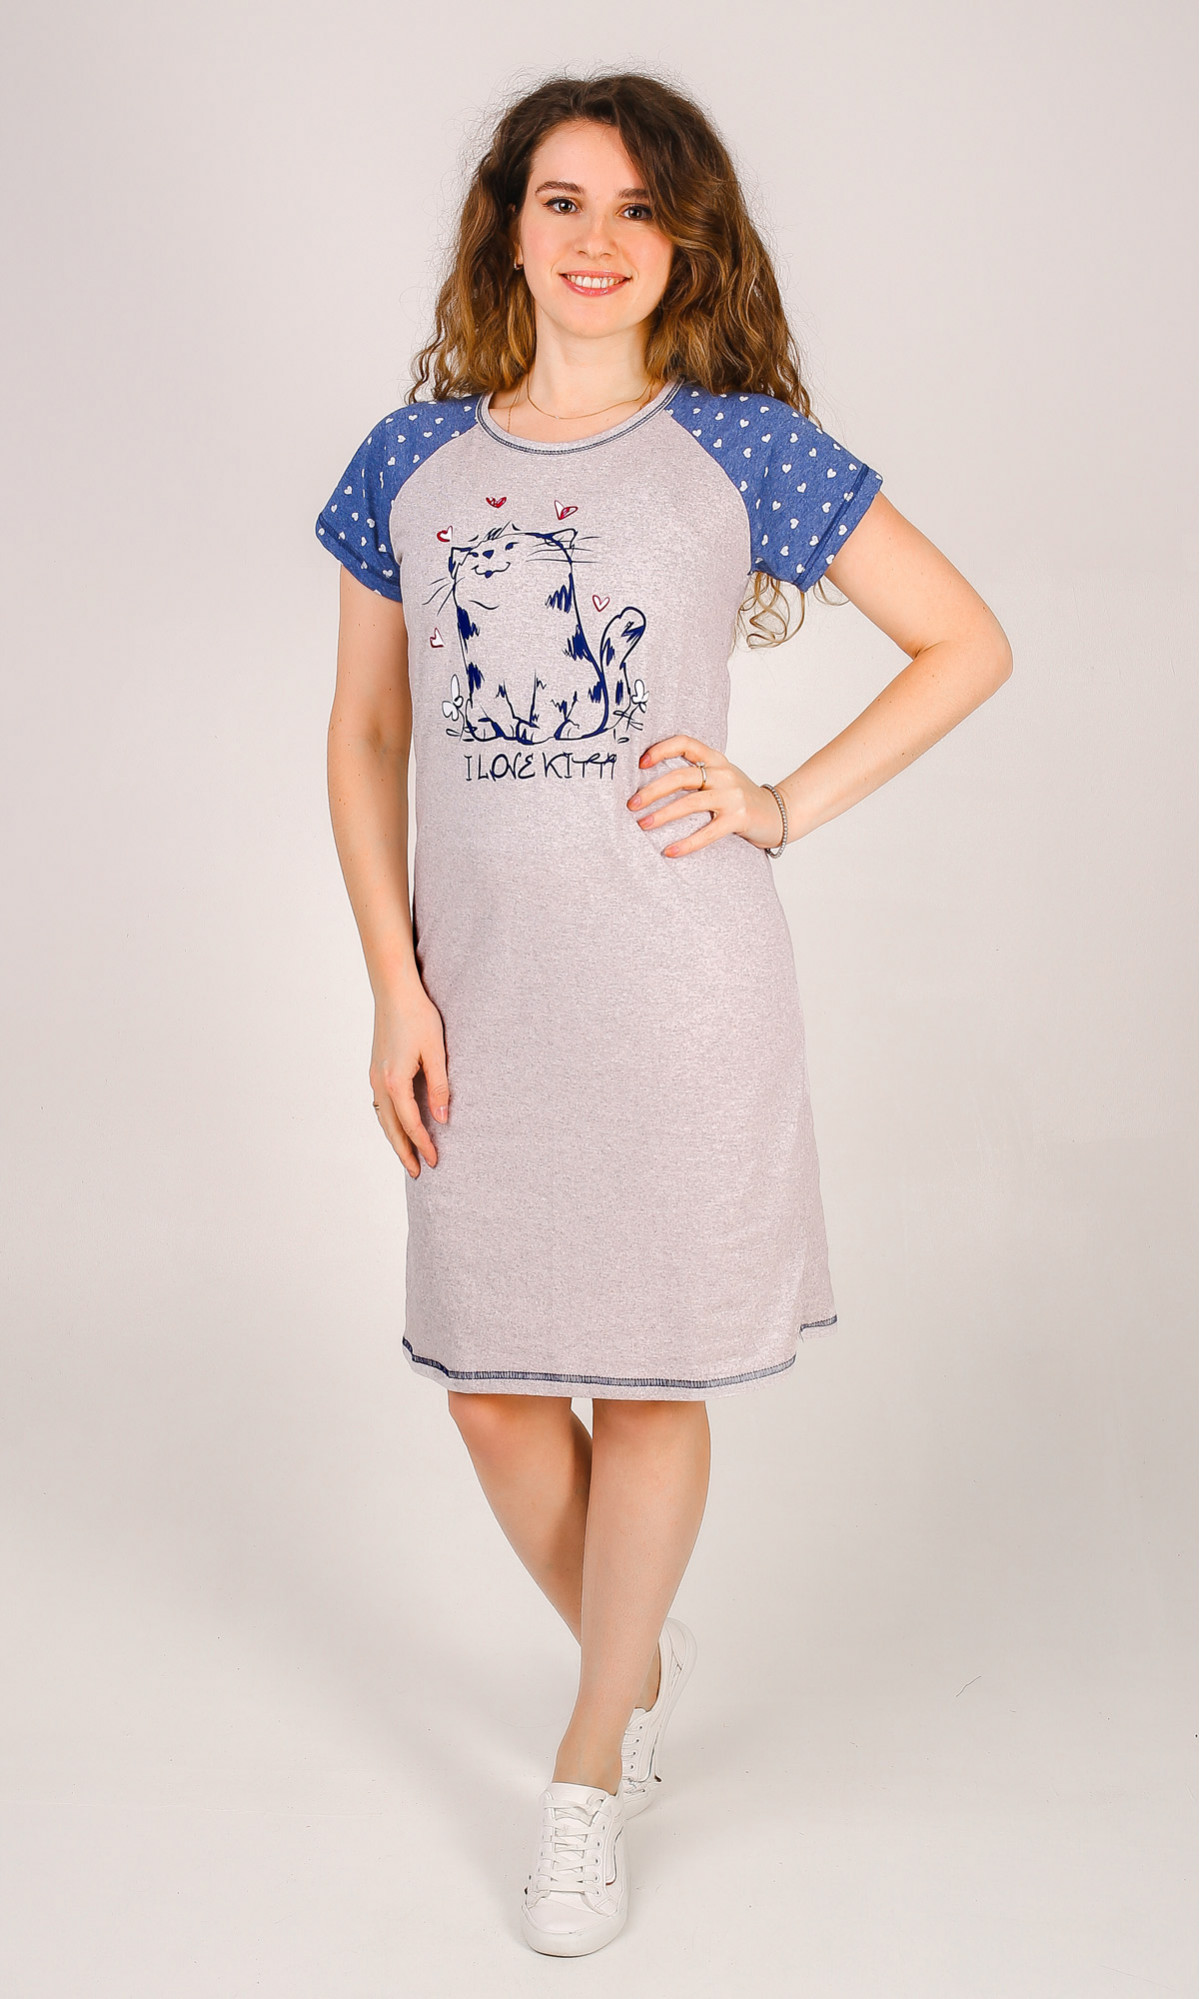 Дарья Т-0020 платье женское